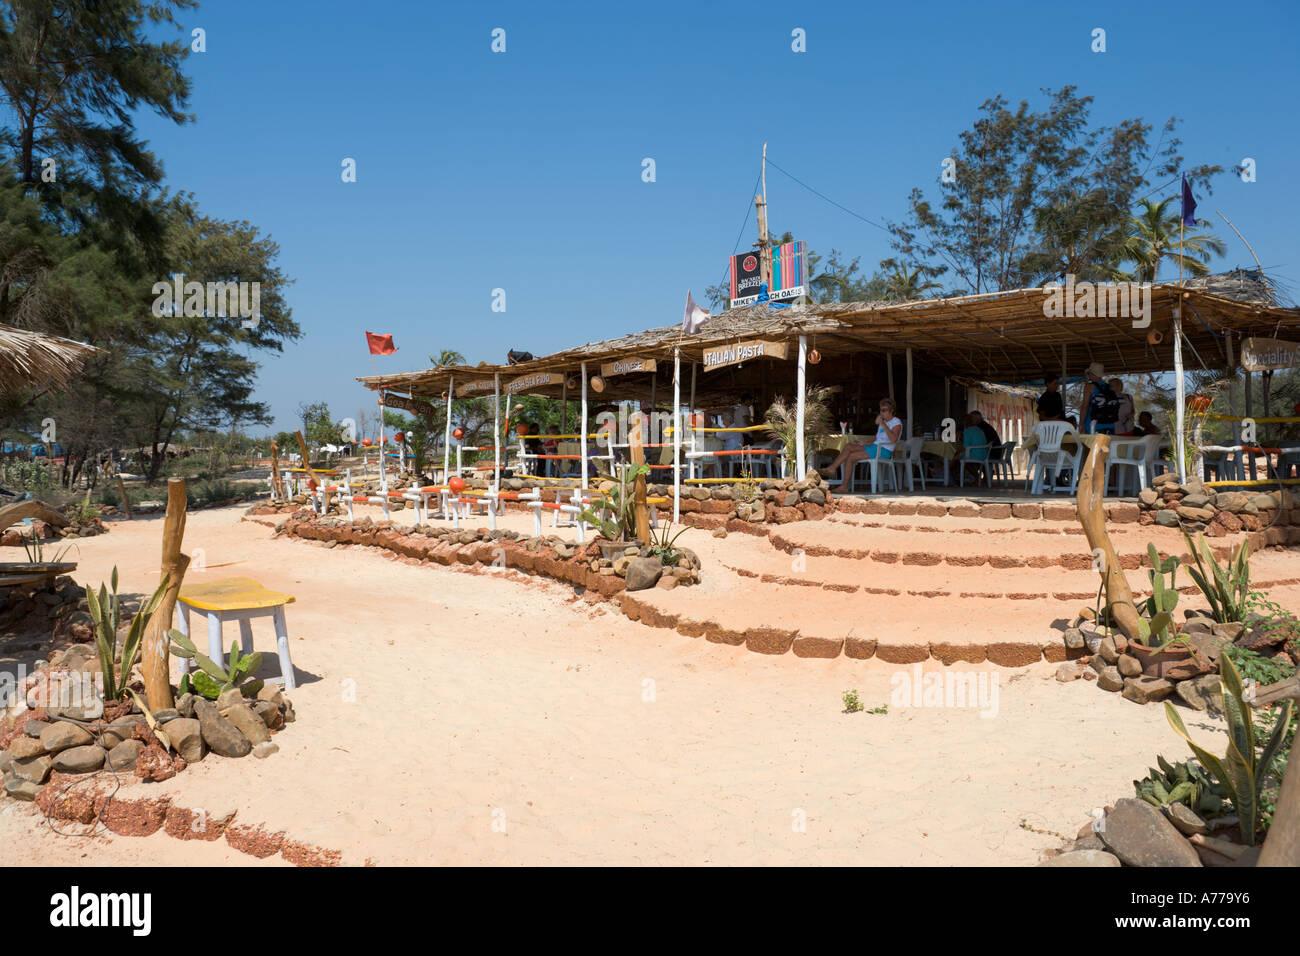 Resort Similar To Mike S Beach